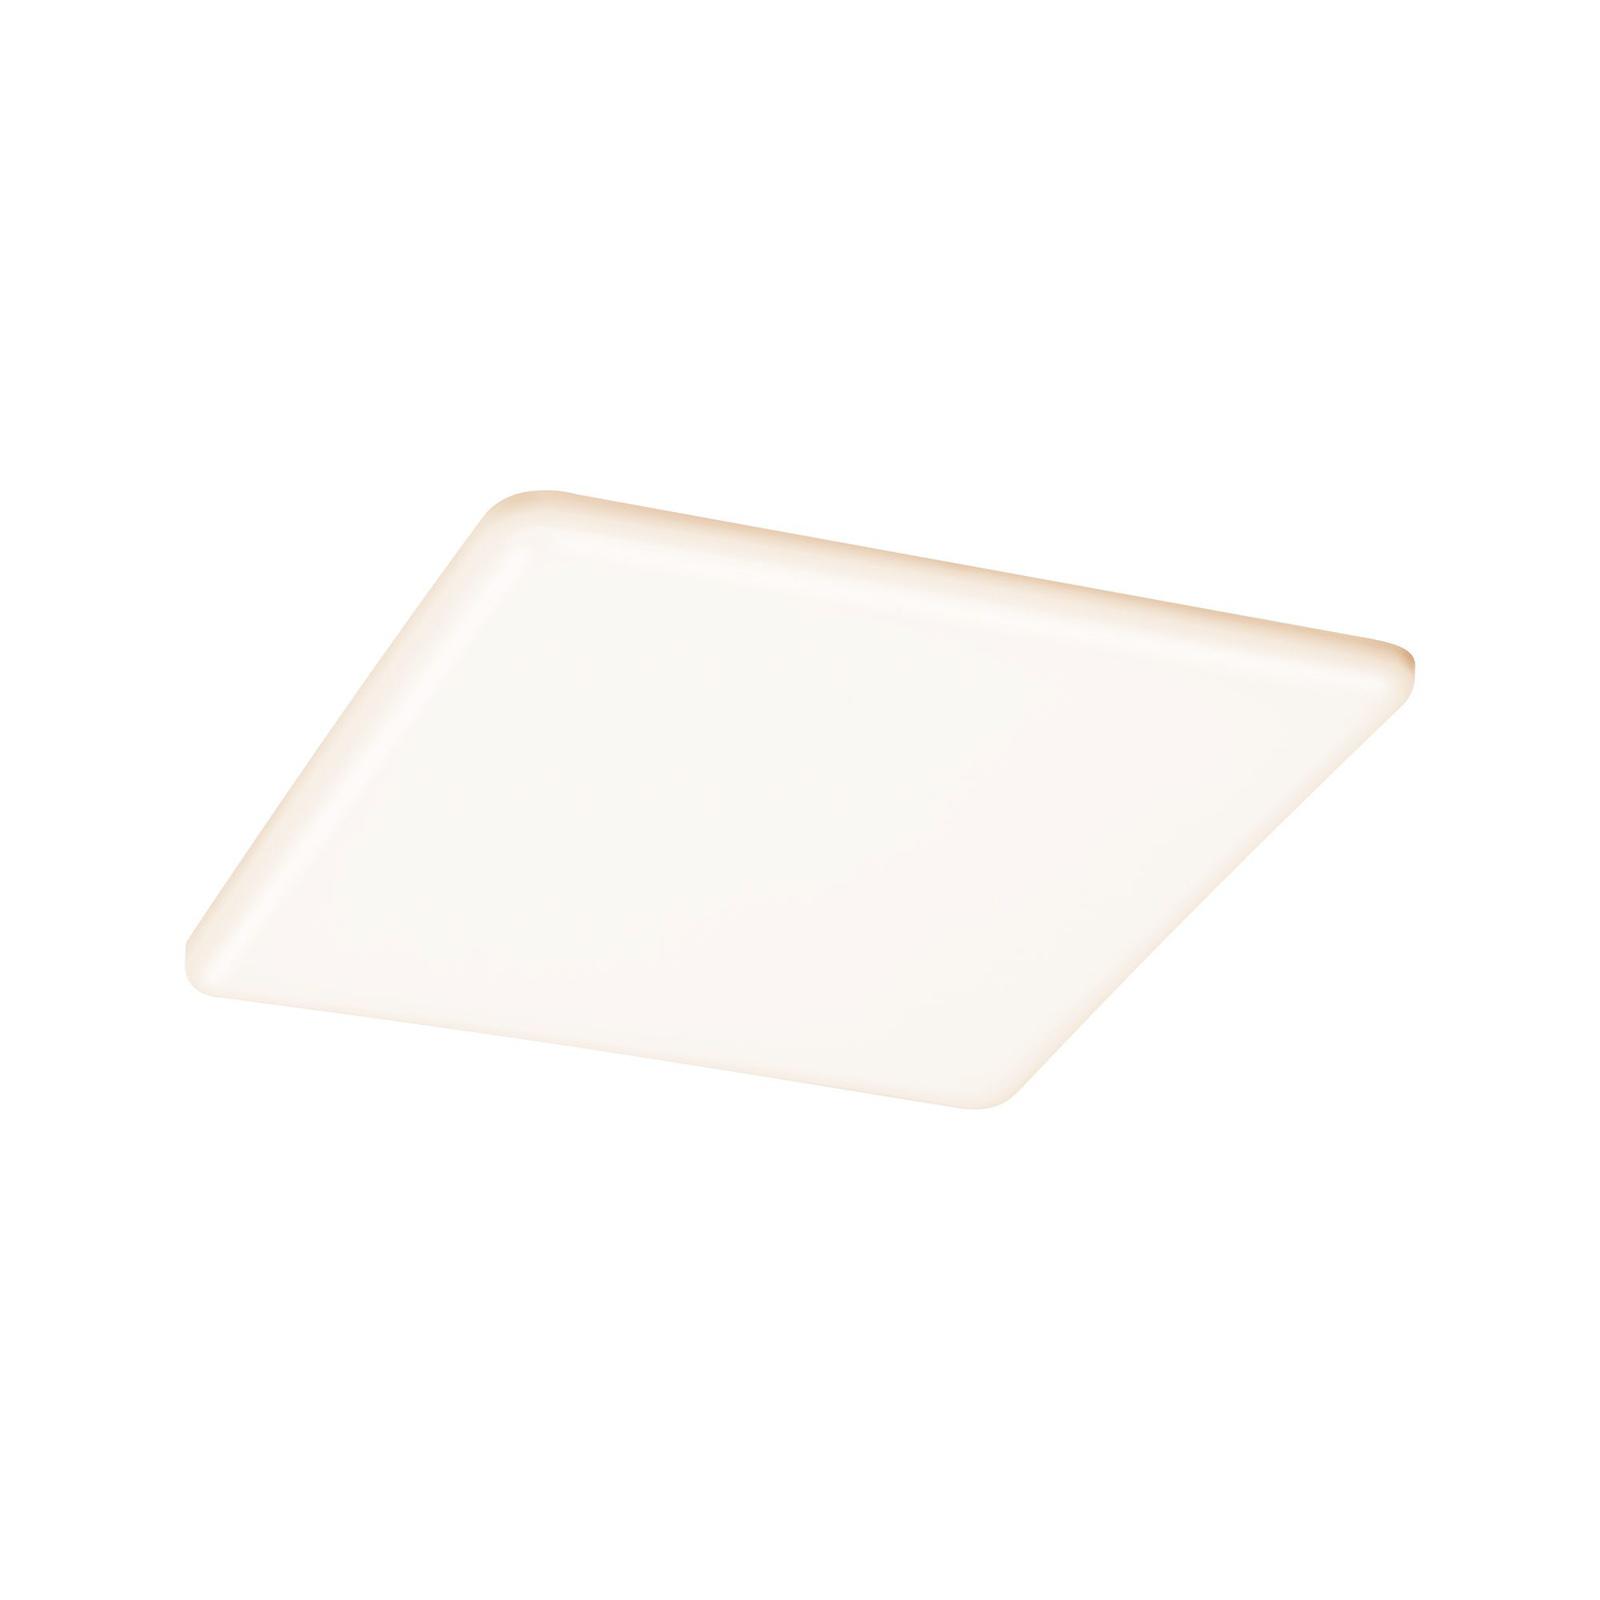 Paulmann LED-Panel Veluna eckig 3-Step CCT 18,5cm